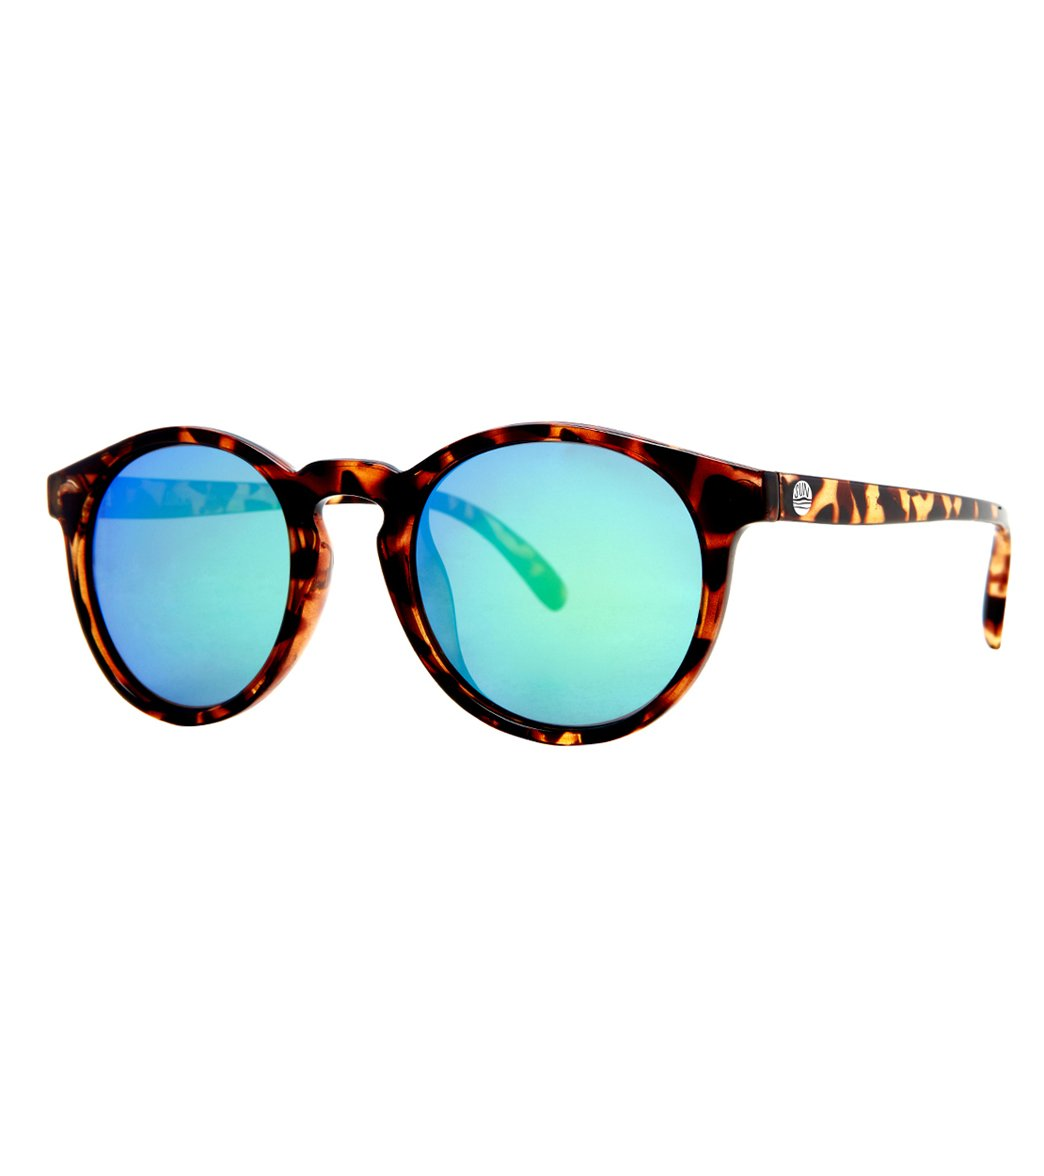 cb7209c6cf505 Sunski Dipseas Polarized Sunglasses at SwimOutlet.com - Free Shipping